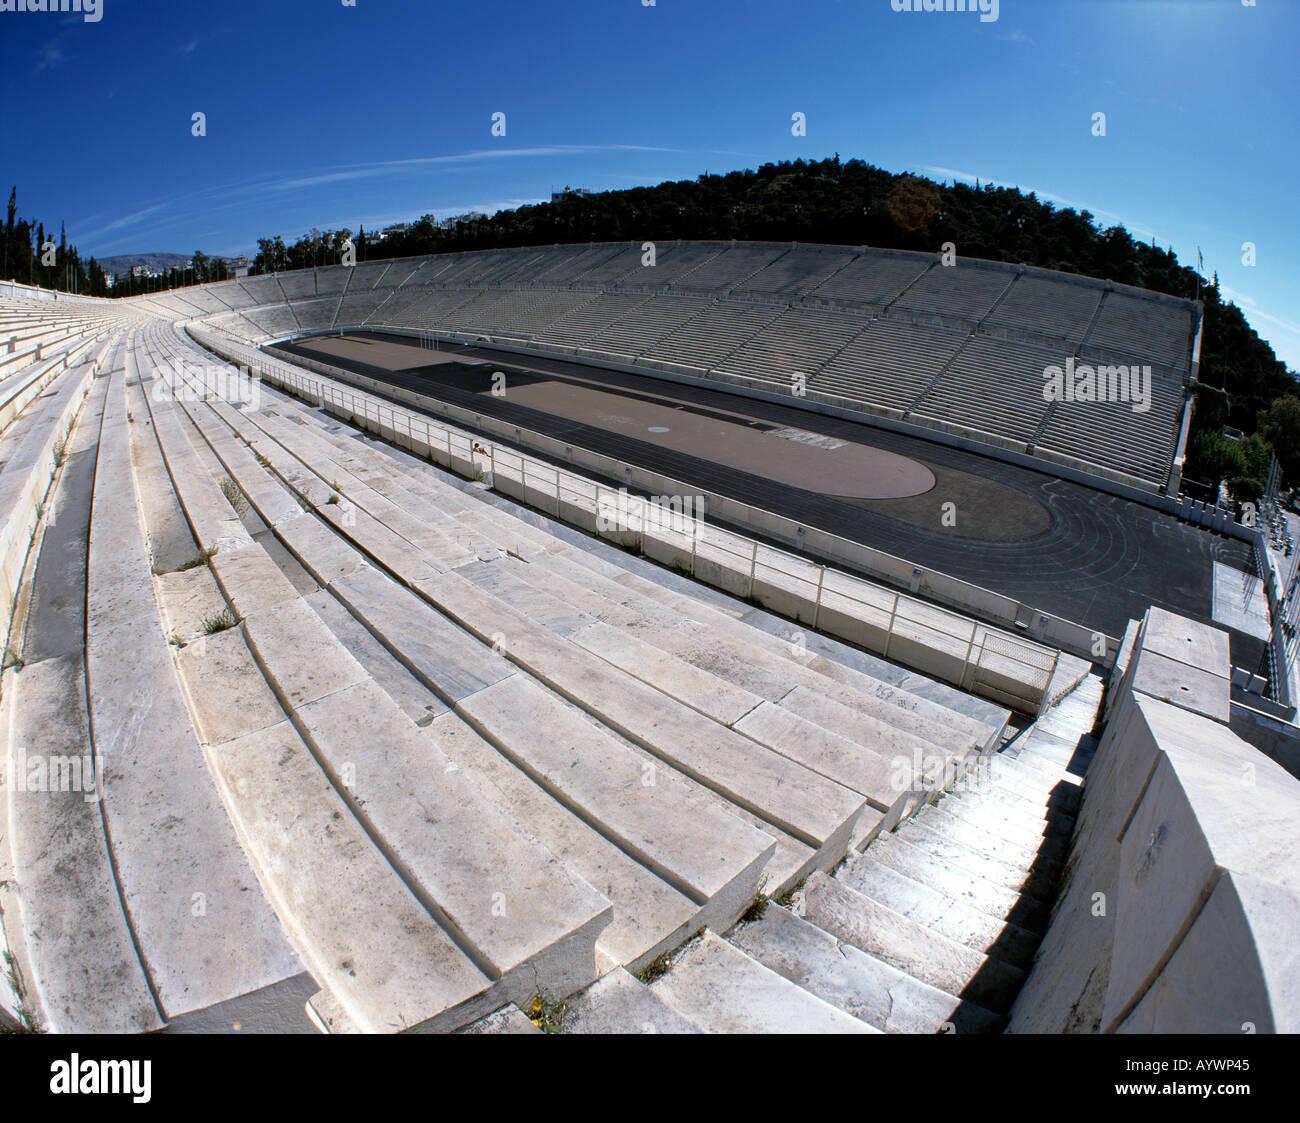 Greece, GR-Athens, Attica, stadium - Stock Image